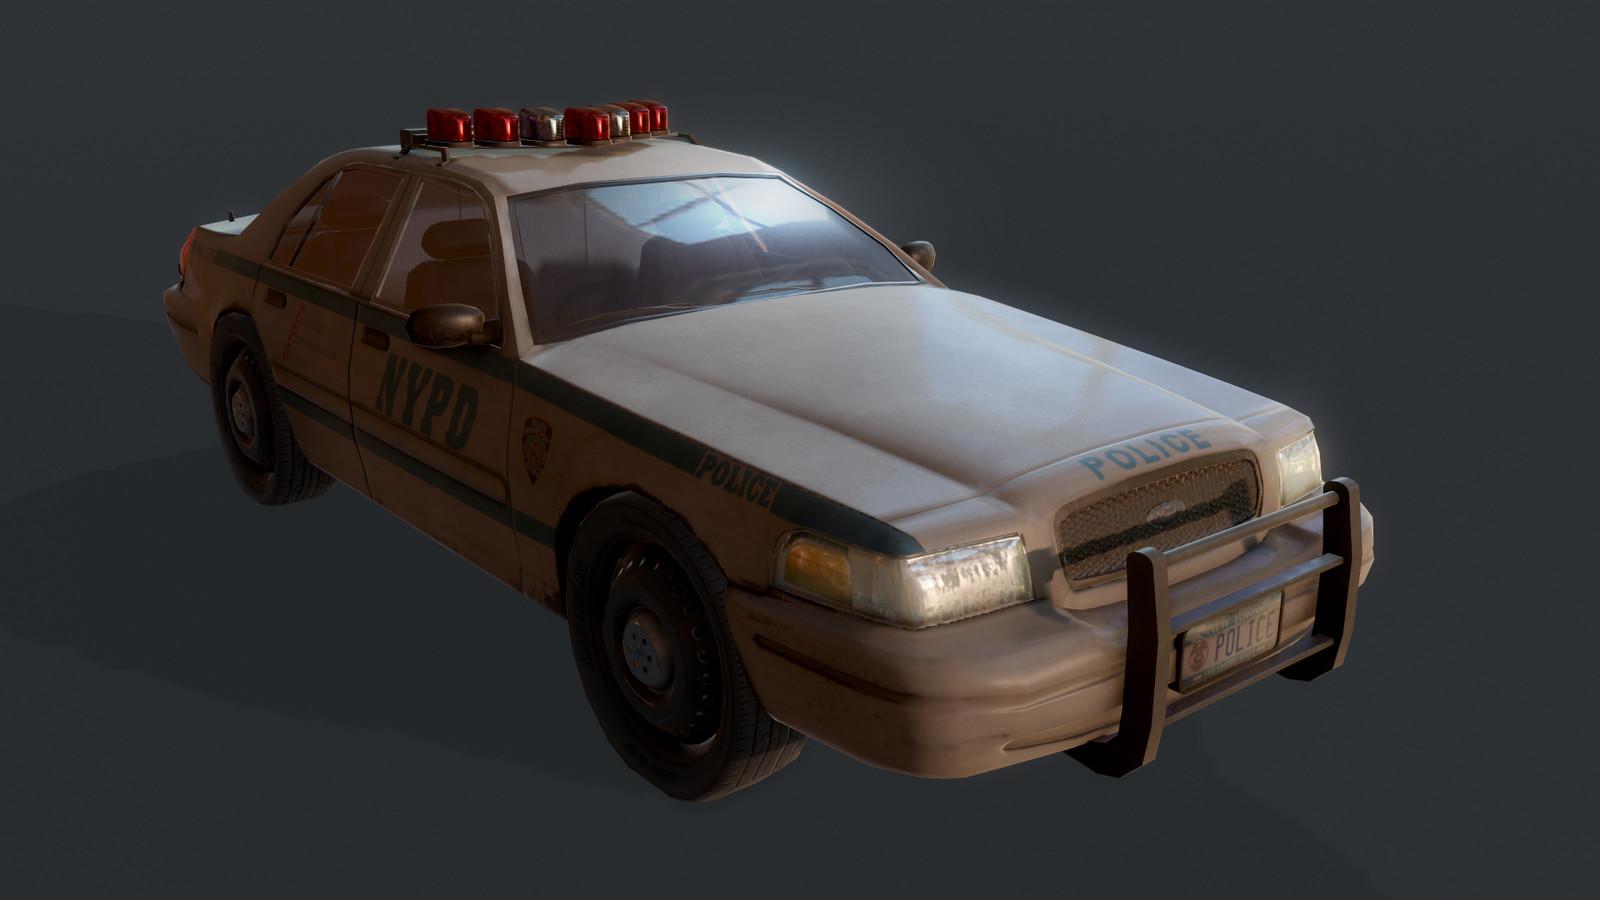 NYPD Sedans